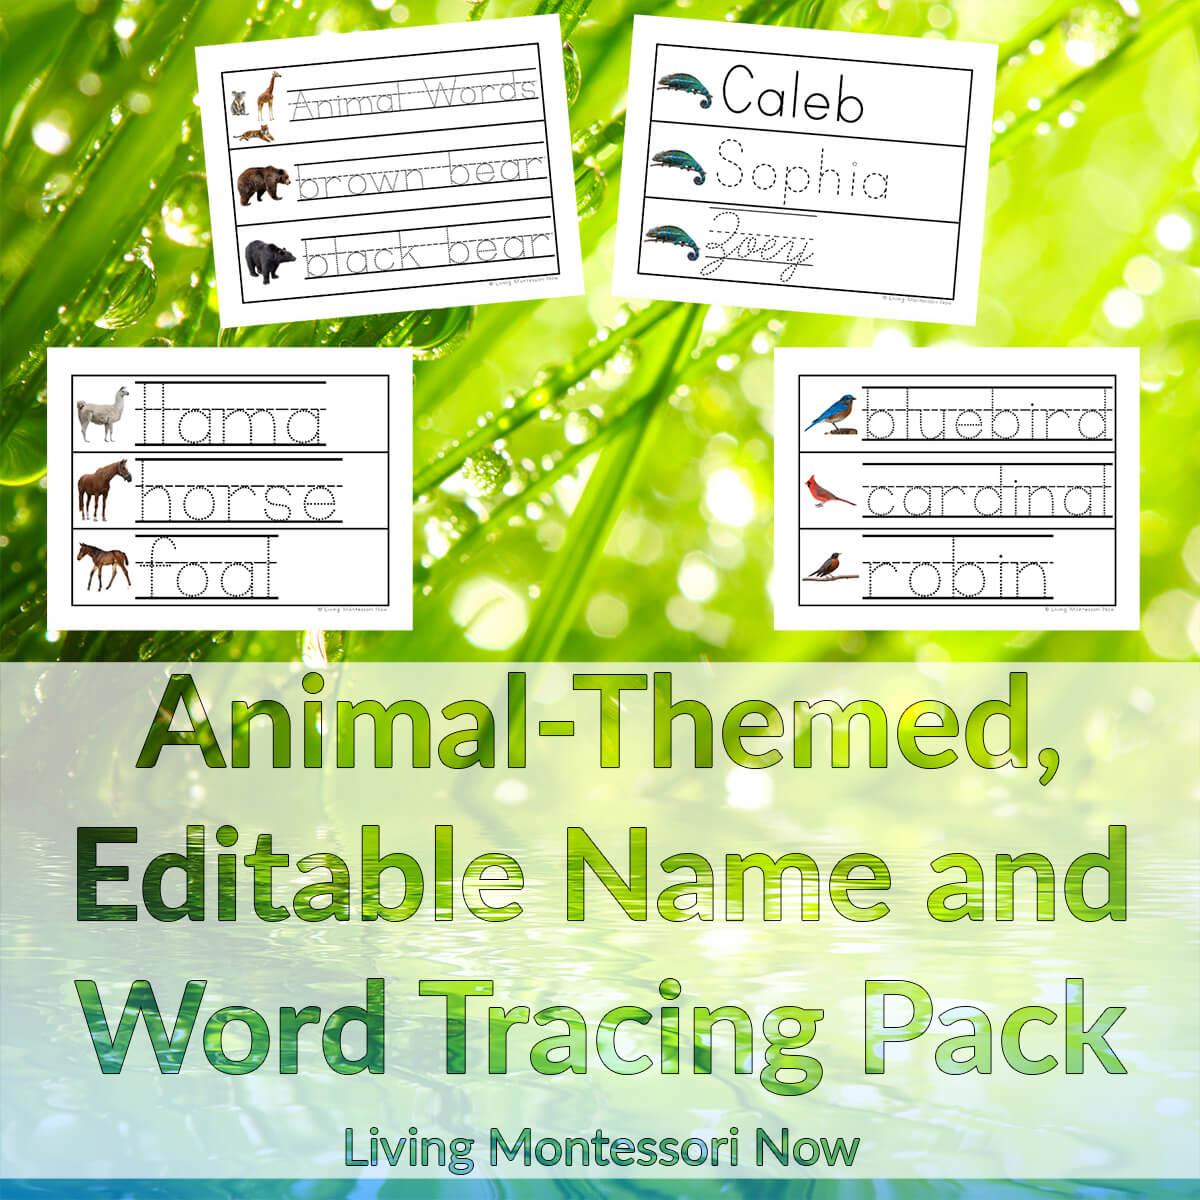 Animal-Themed, Editable Name and Word Tracing Pack - LivingMontessoriNow